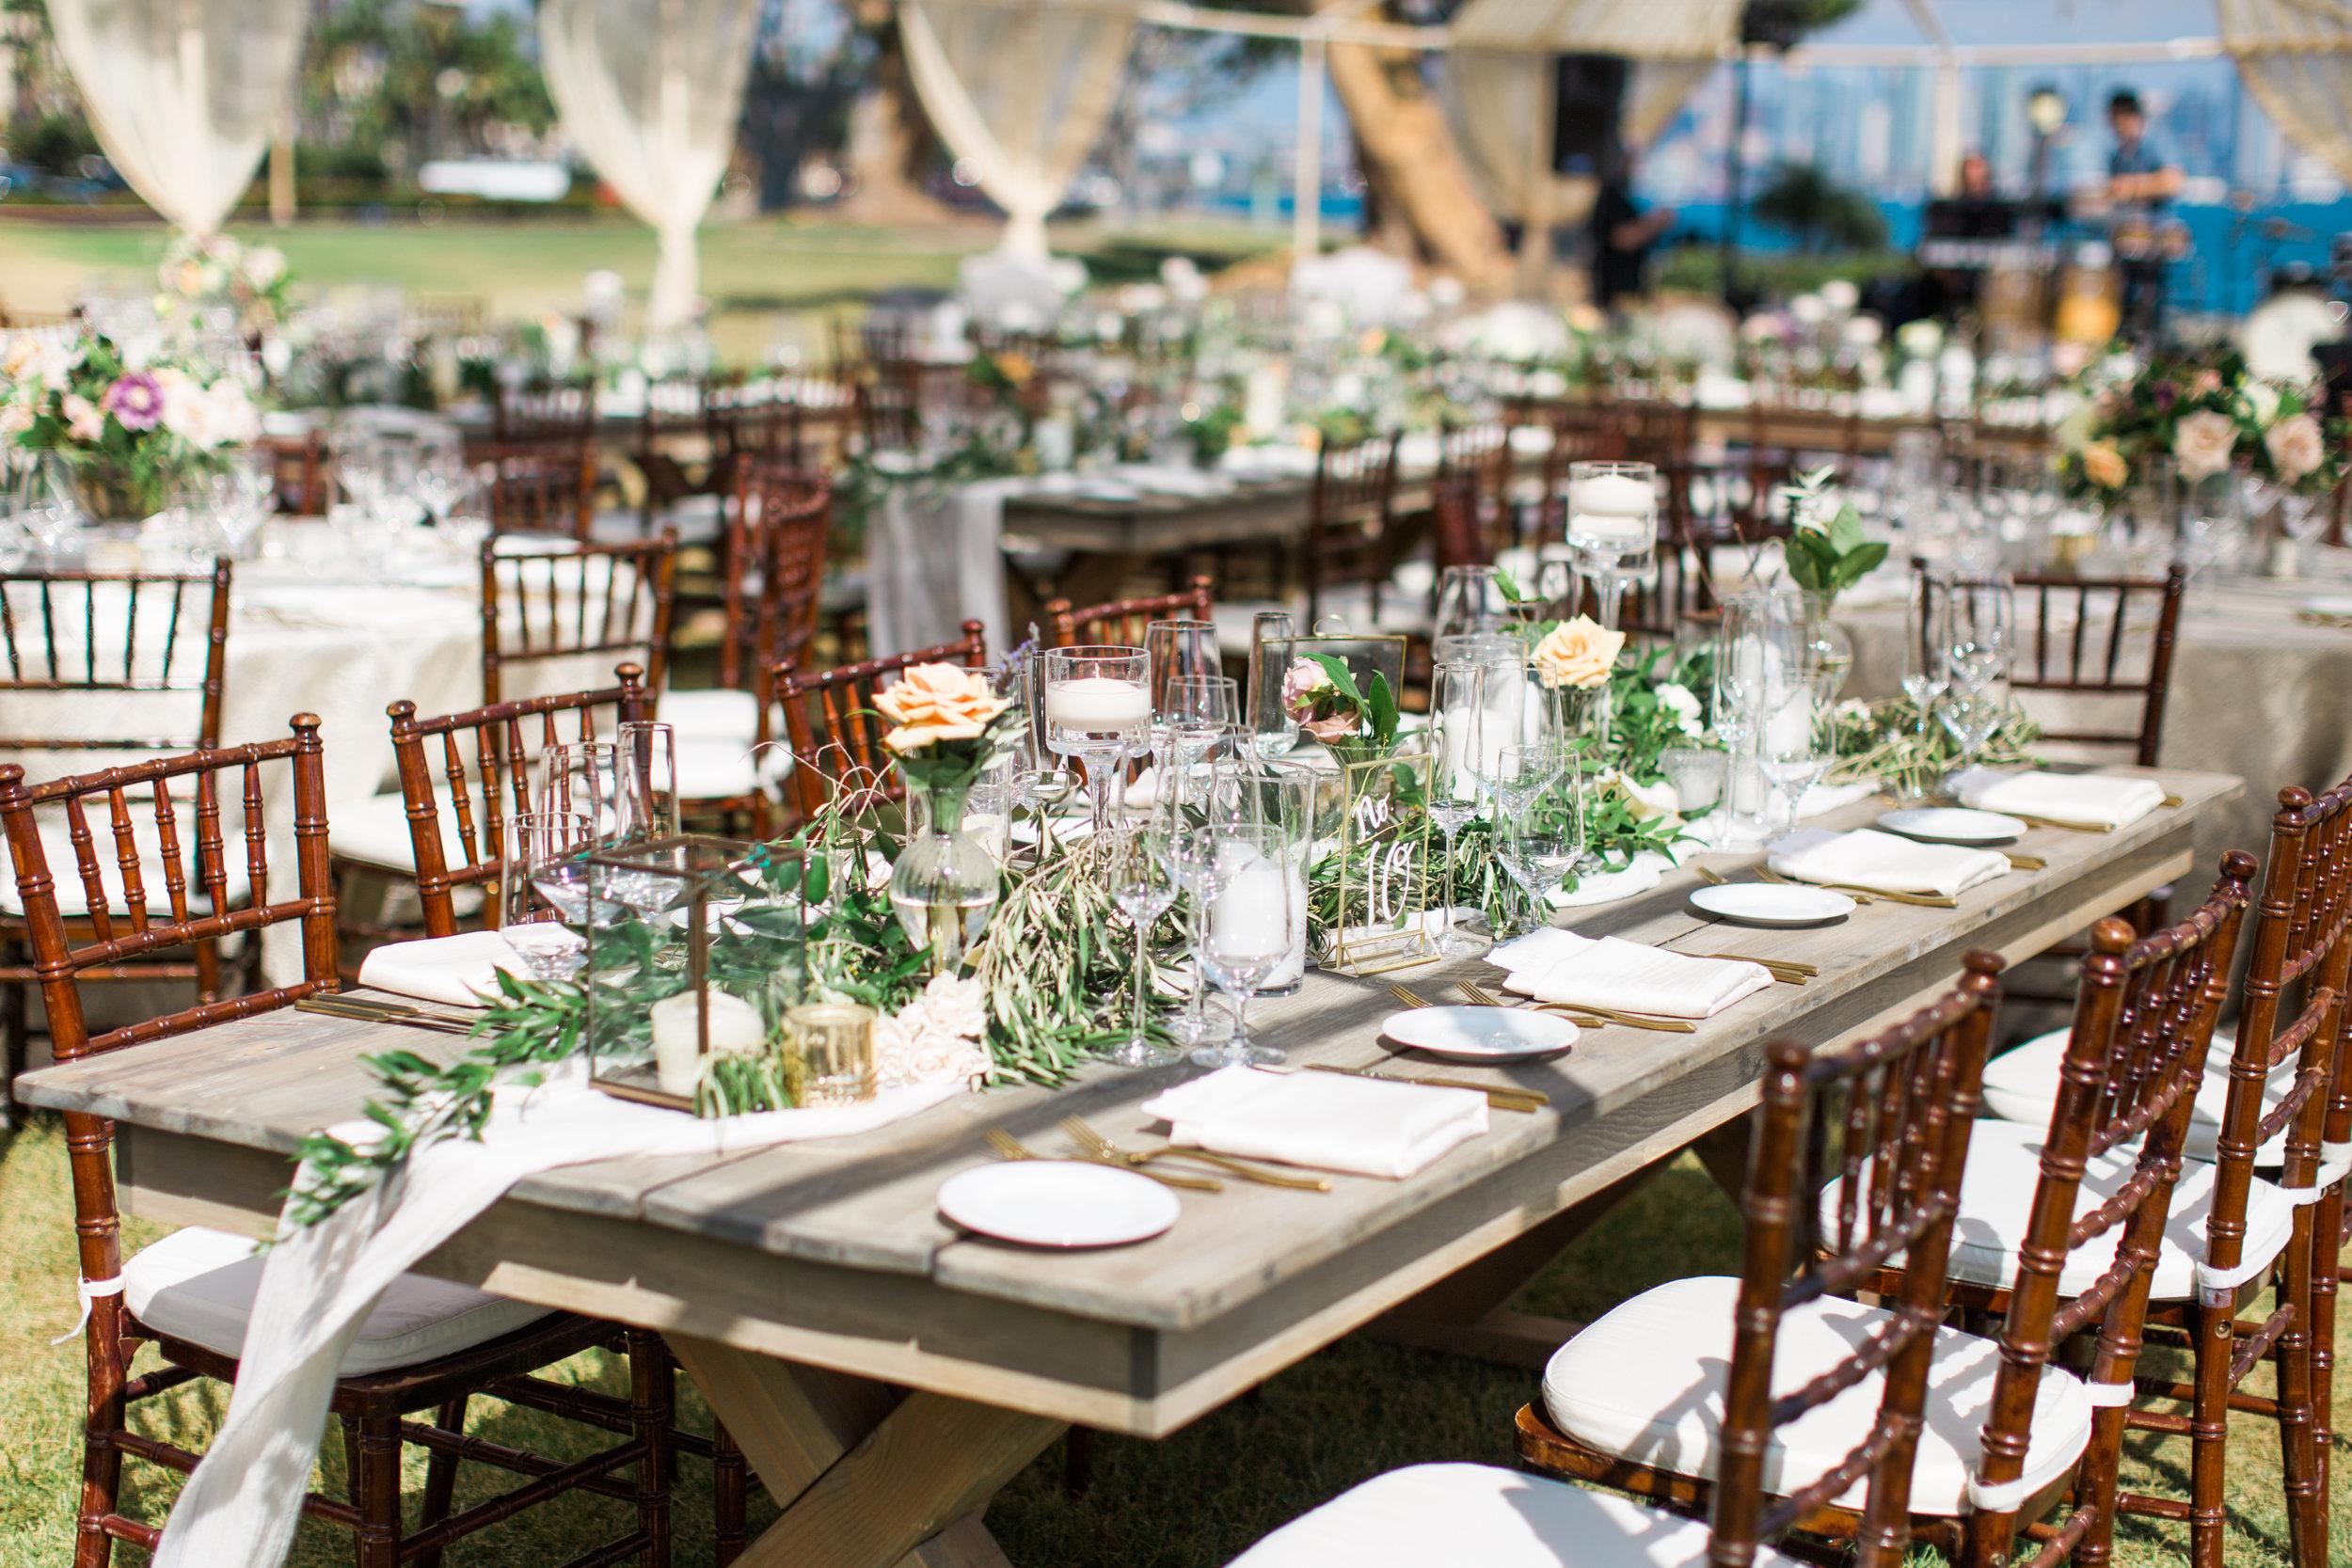 Blooms-breesa-lee-luxury-florist-aga-jones-tres-chic-affairs-san-diego-wedding-classic-coast-catering-45).jpg